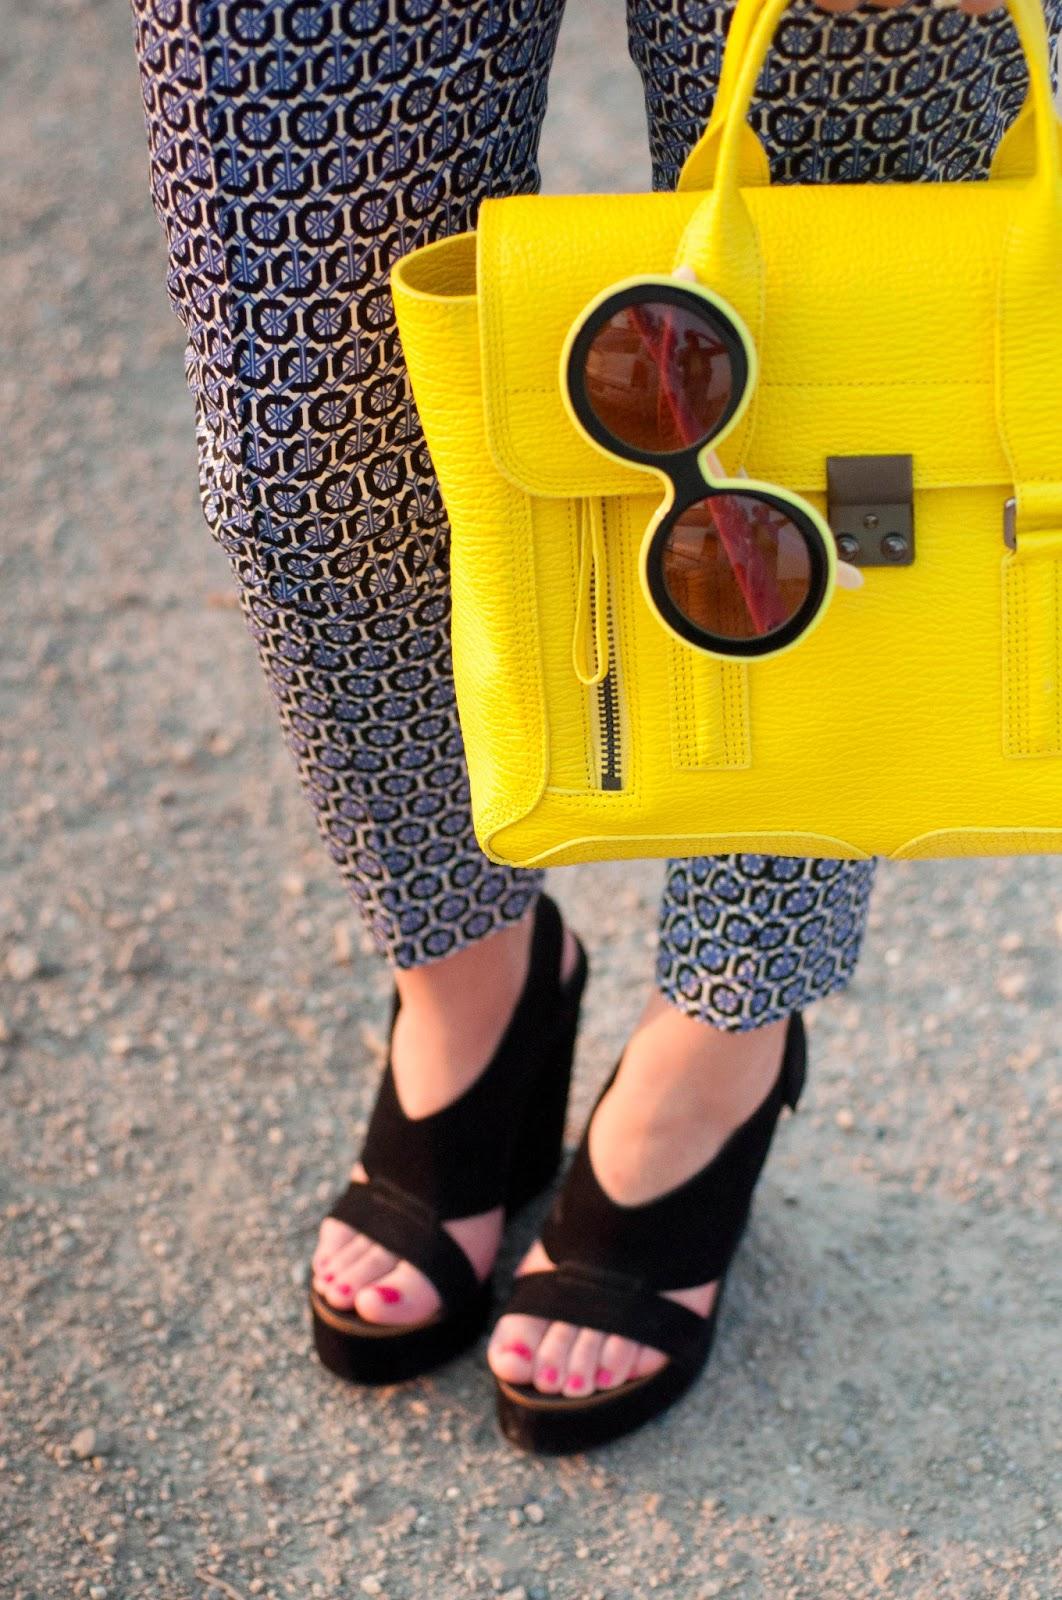 3.1 phillip lim, phillip lim medium pashli satchel, karen walker sunglasses, karen walker iris sunglasses, pedro garcia leather shoes, h and m pants, patterned pants